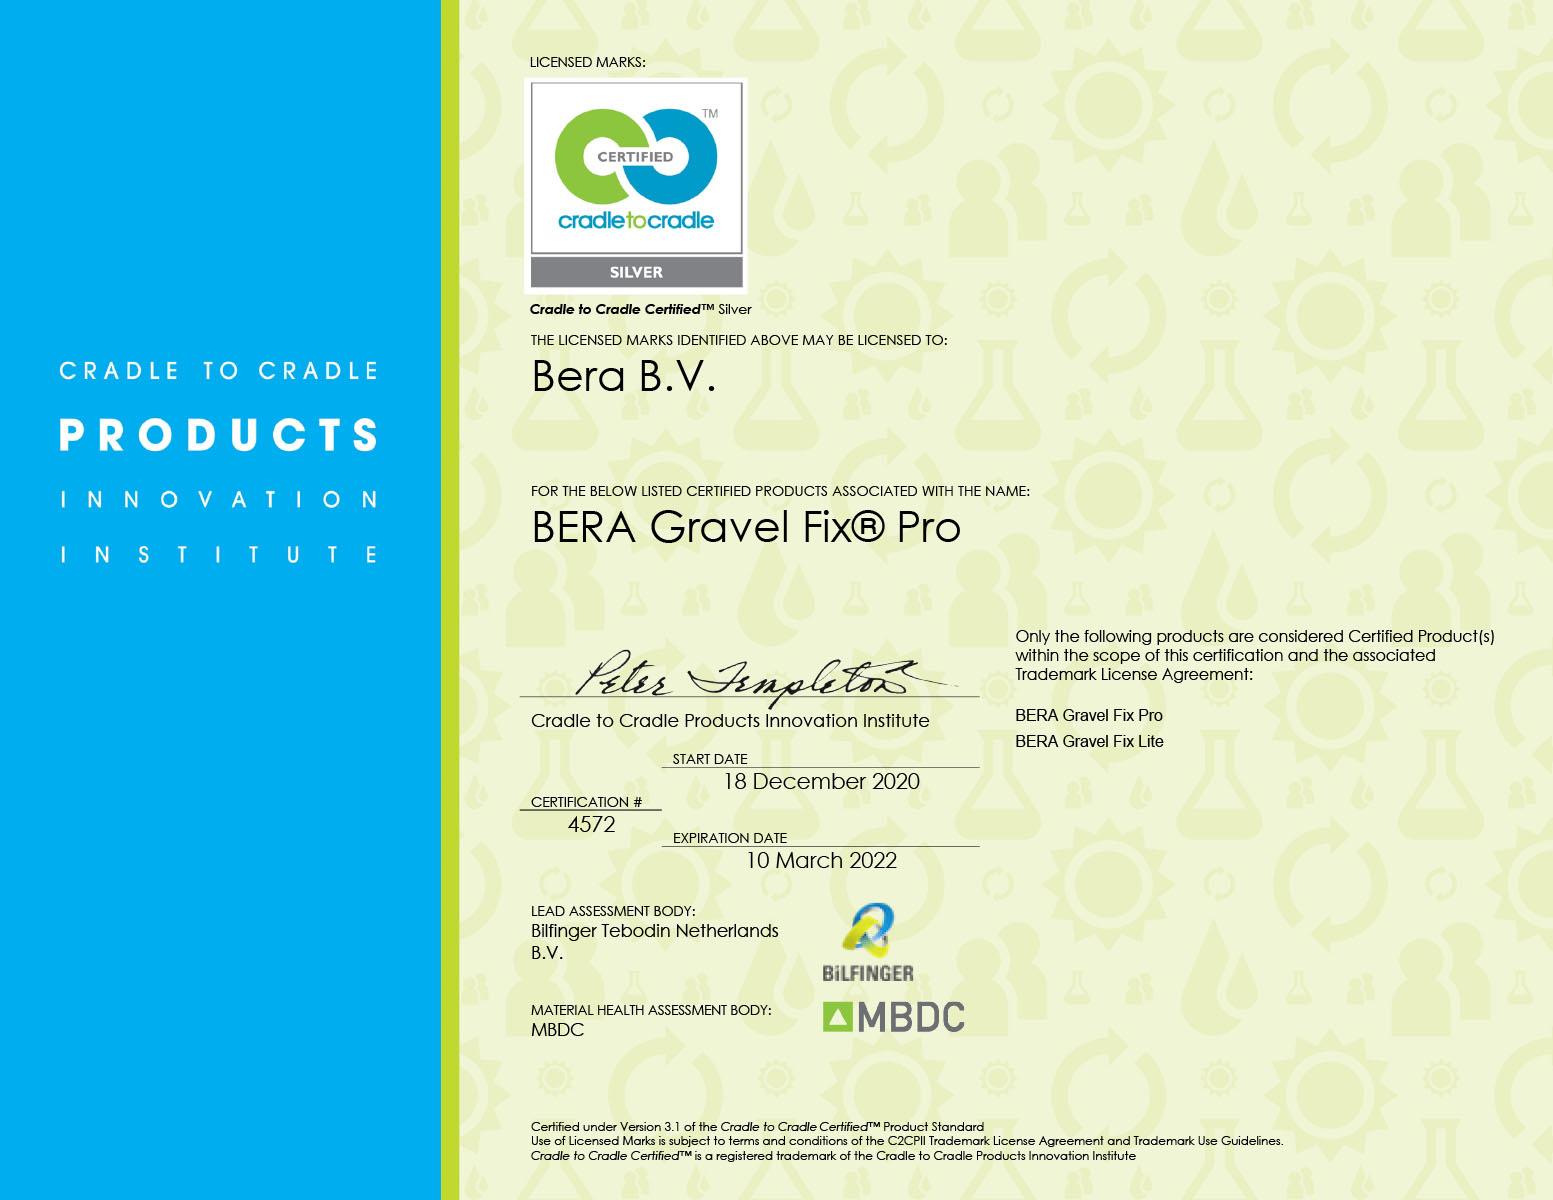 Bera_BERA_Silve_CERT4572_2020-12-18